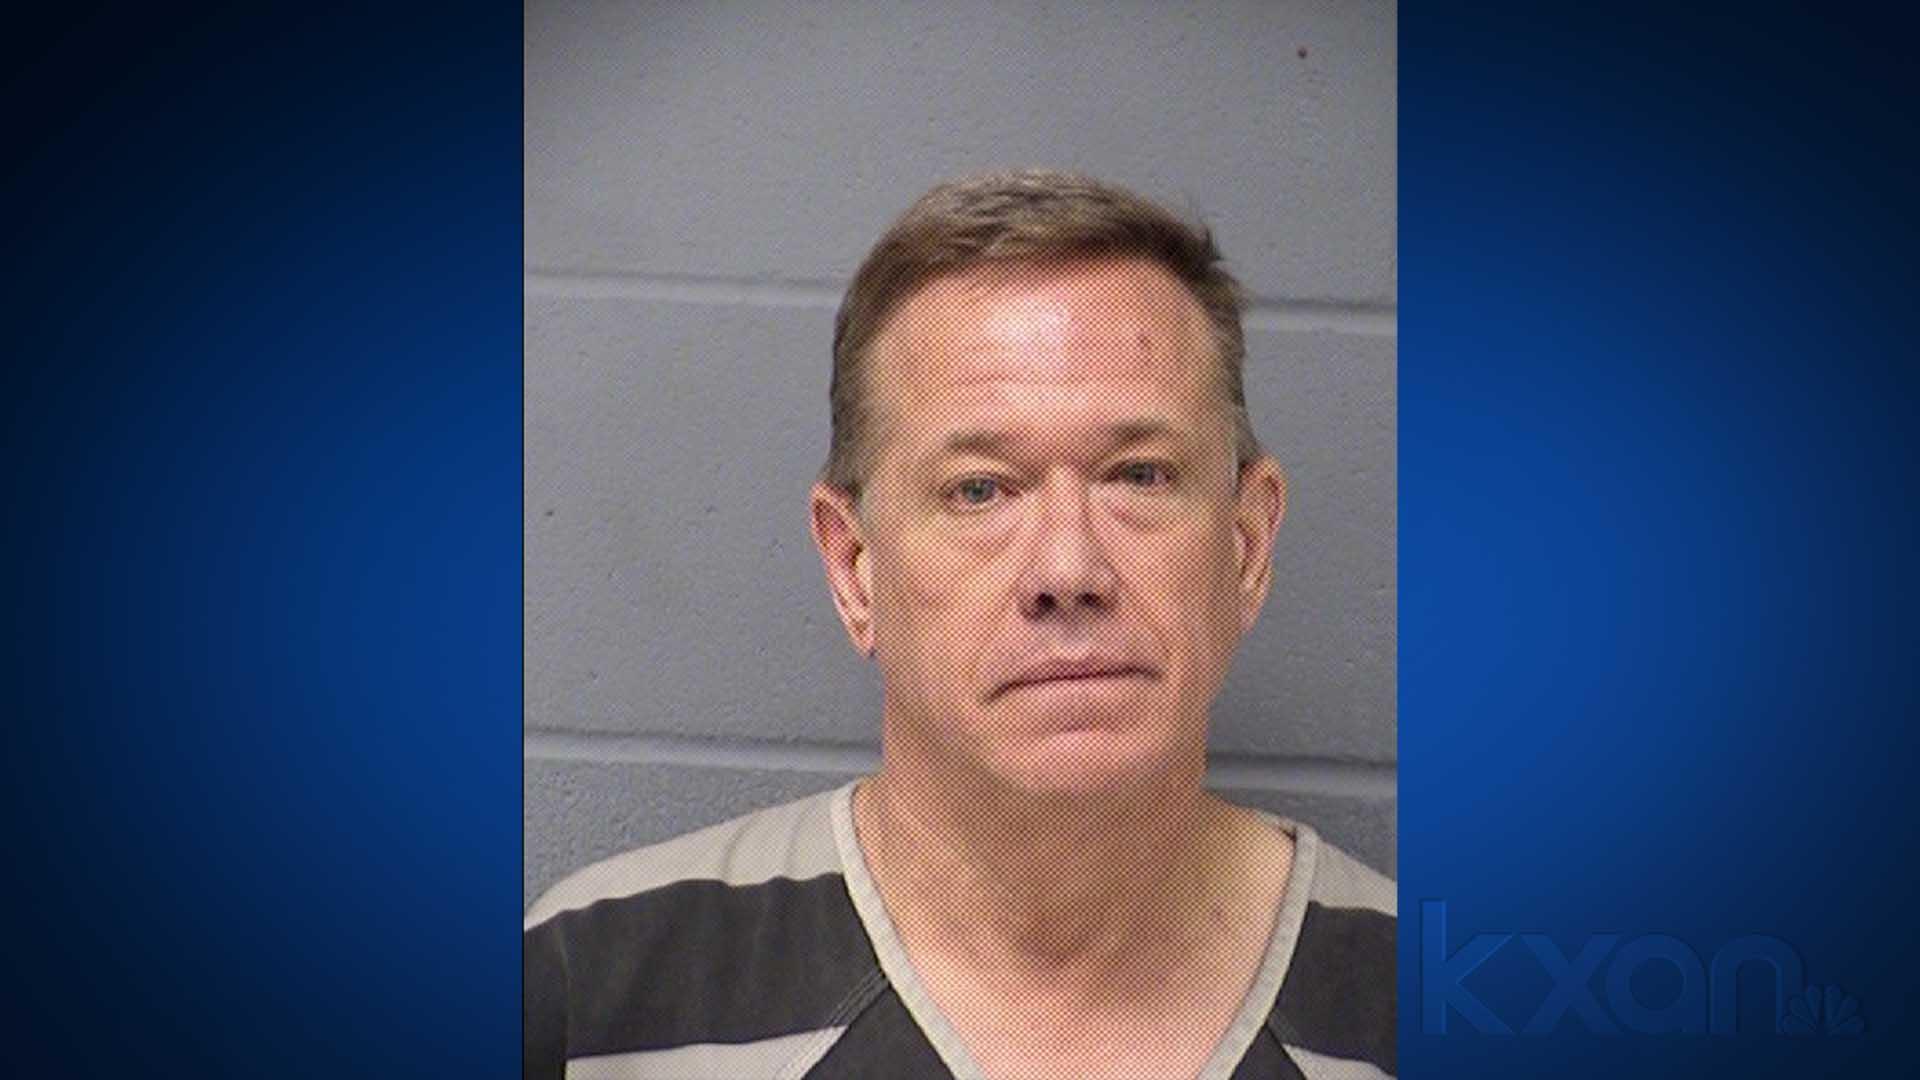 Todd Malcom Smith, 59 (Texas Department of Public Safety Photo)